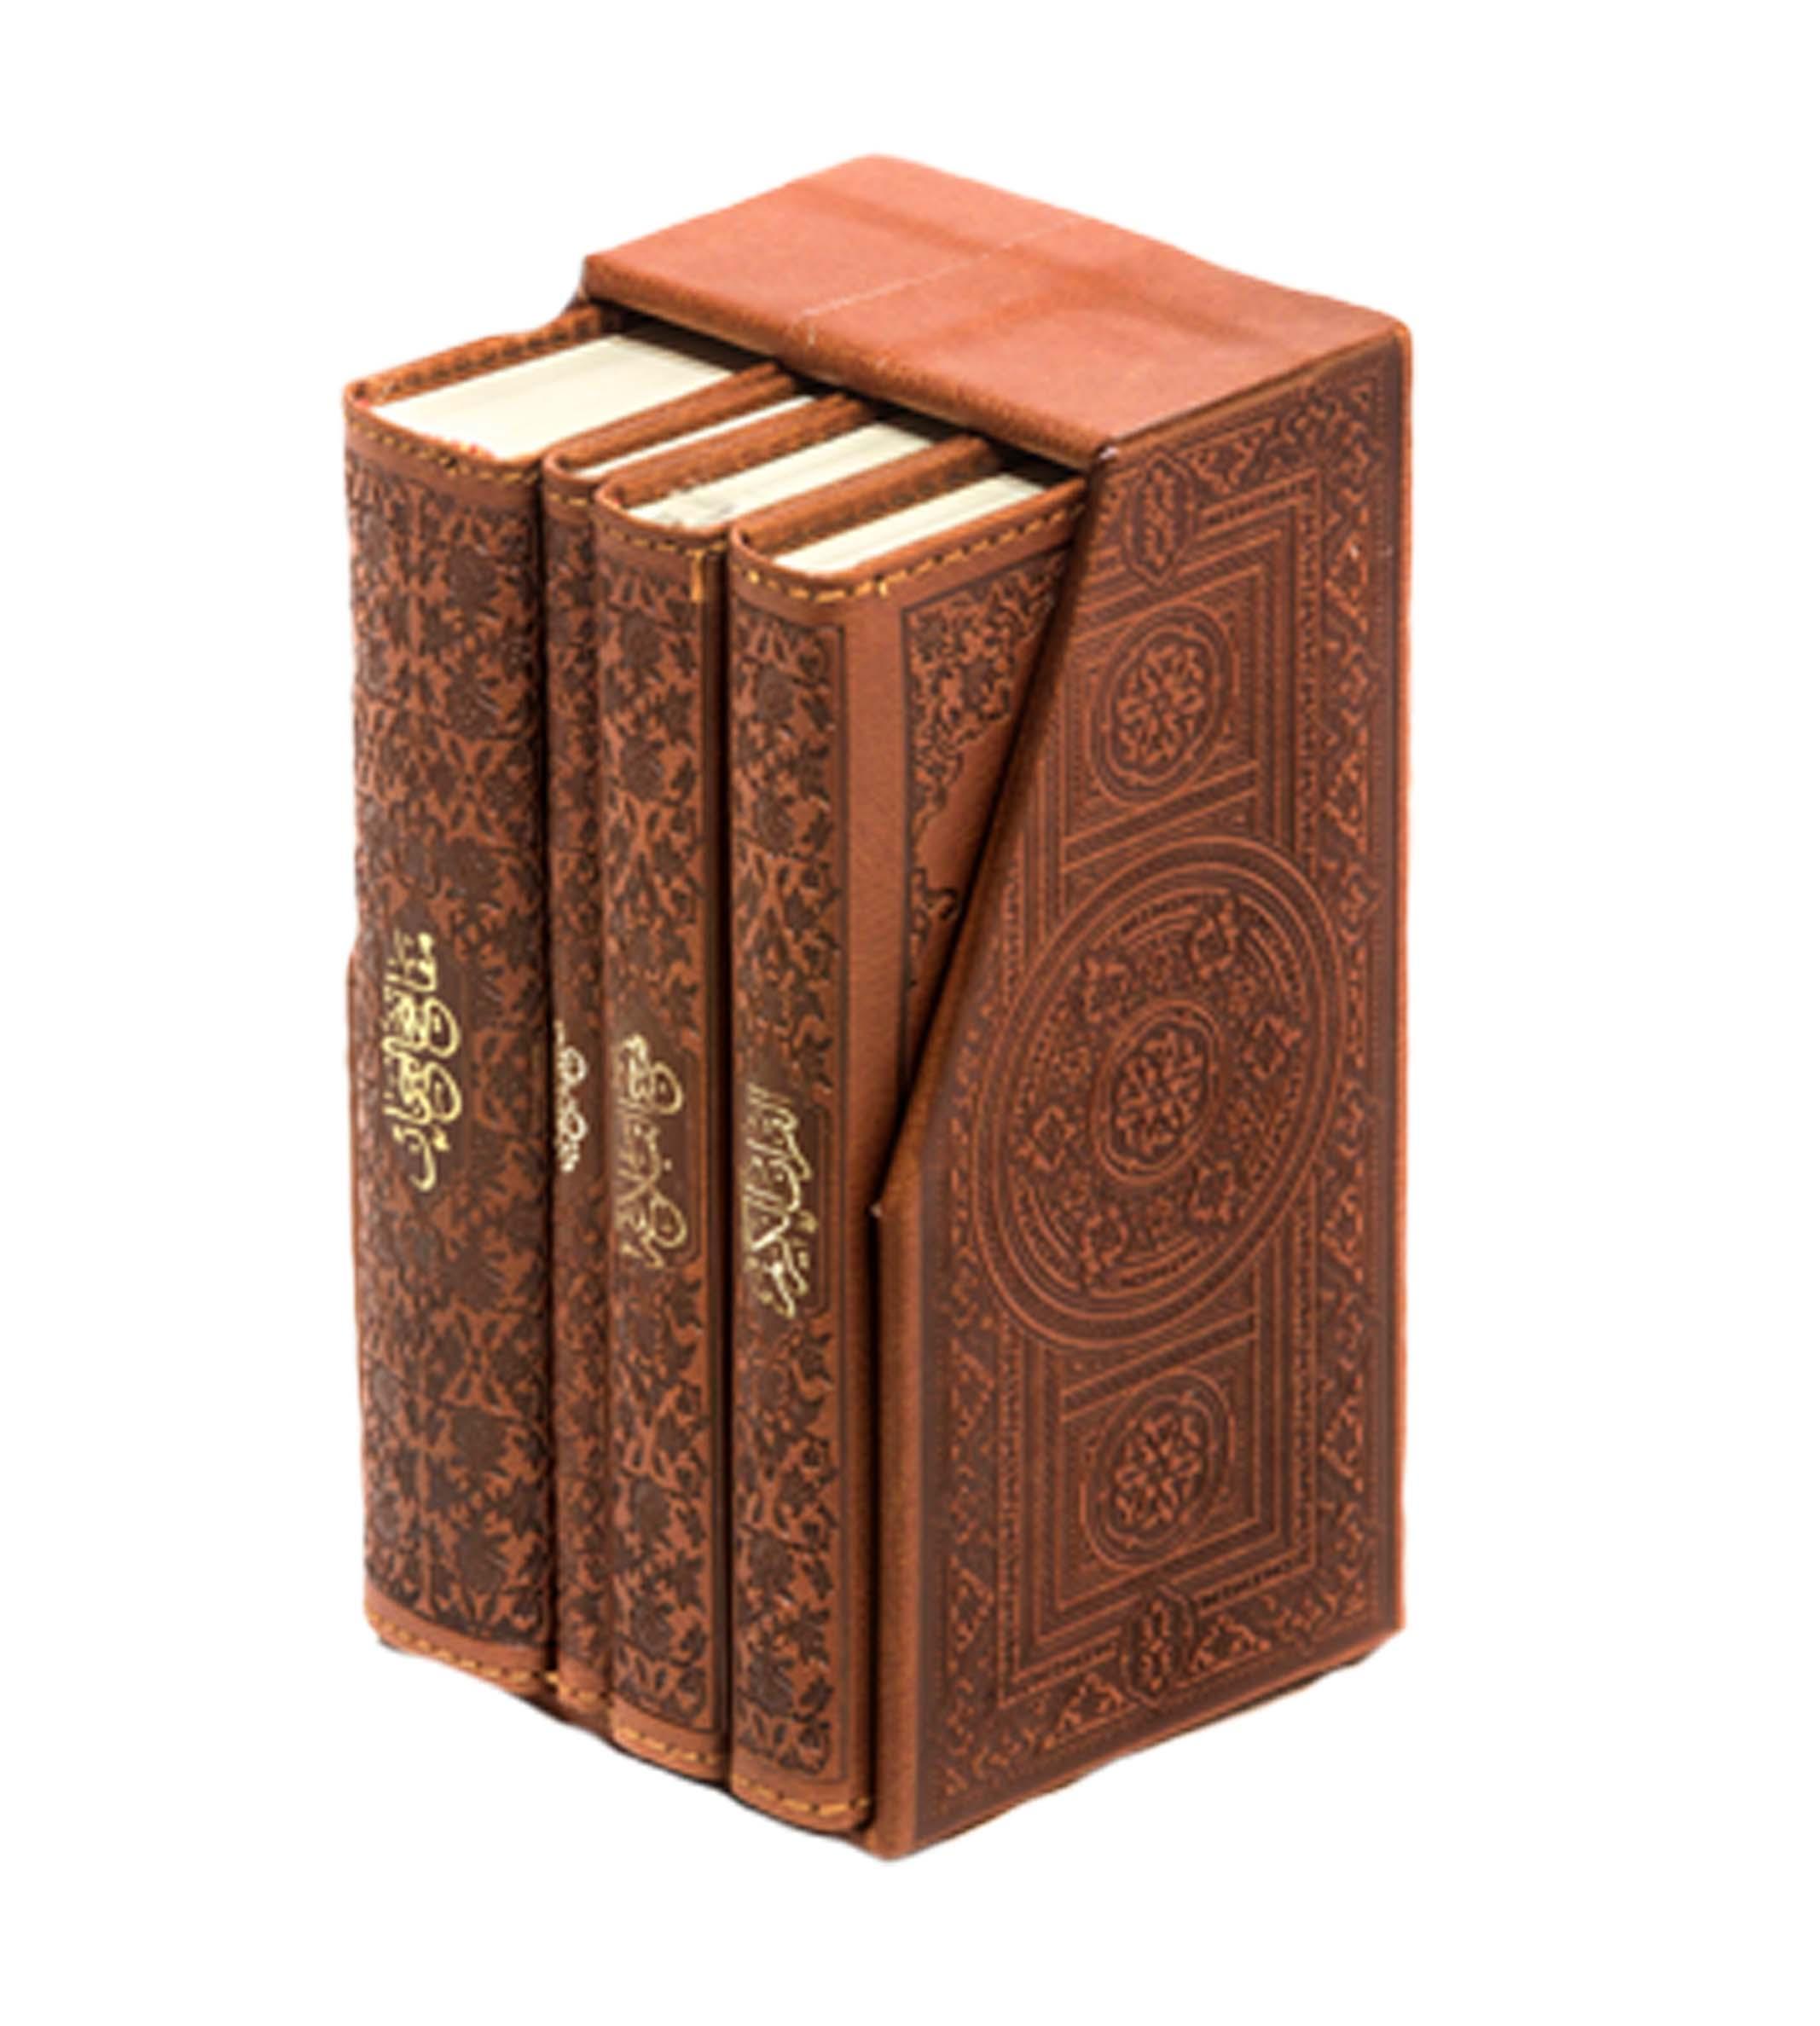 پک 4 جلدی قرآن، مفاتیح الجنان، صحیفه سجادیه، نهج البلاغه